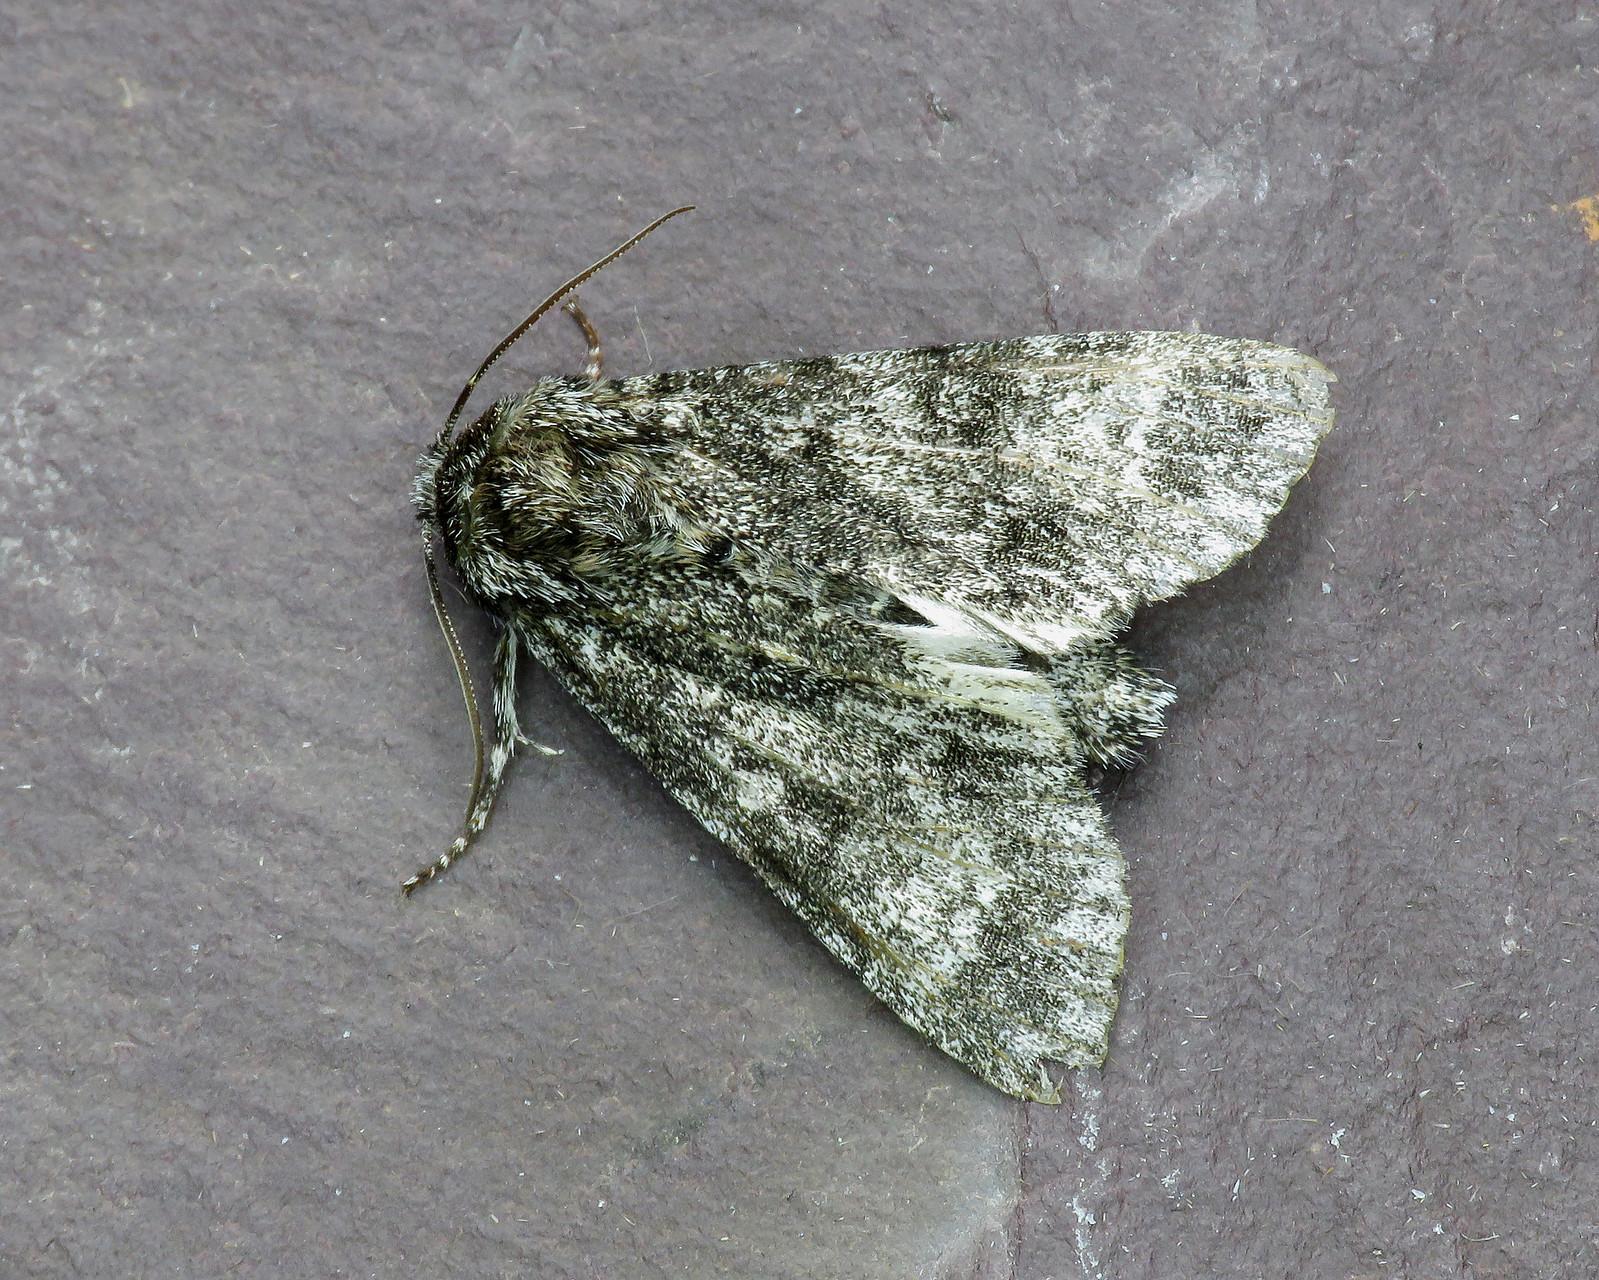 73.046 BF2278 Poplar Grey - Subacronicta megacephala